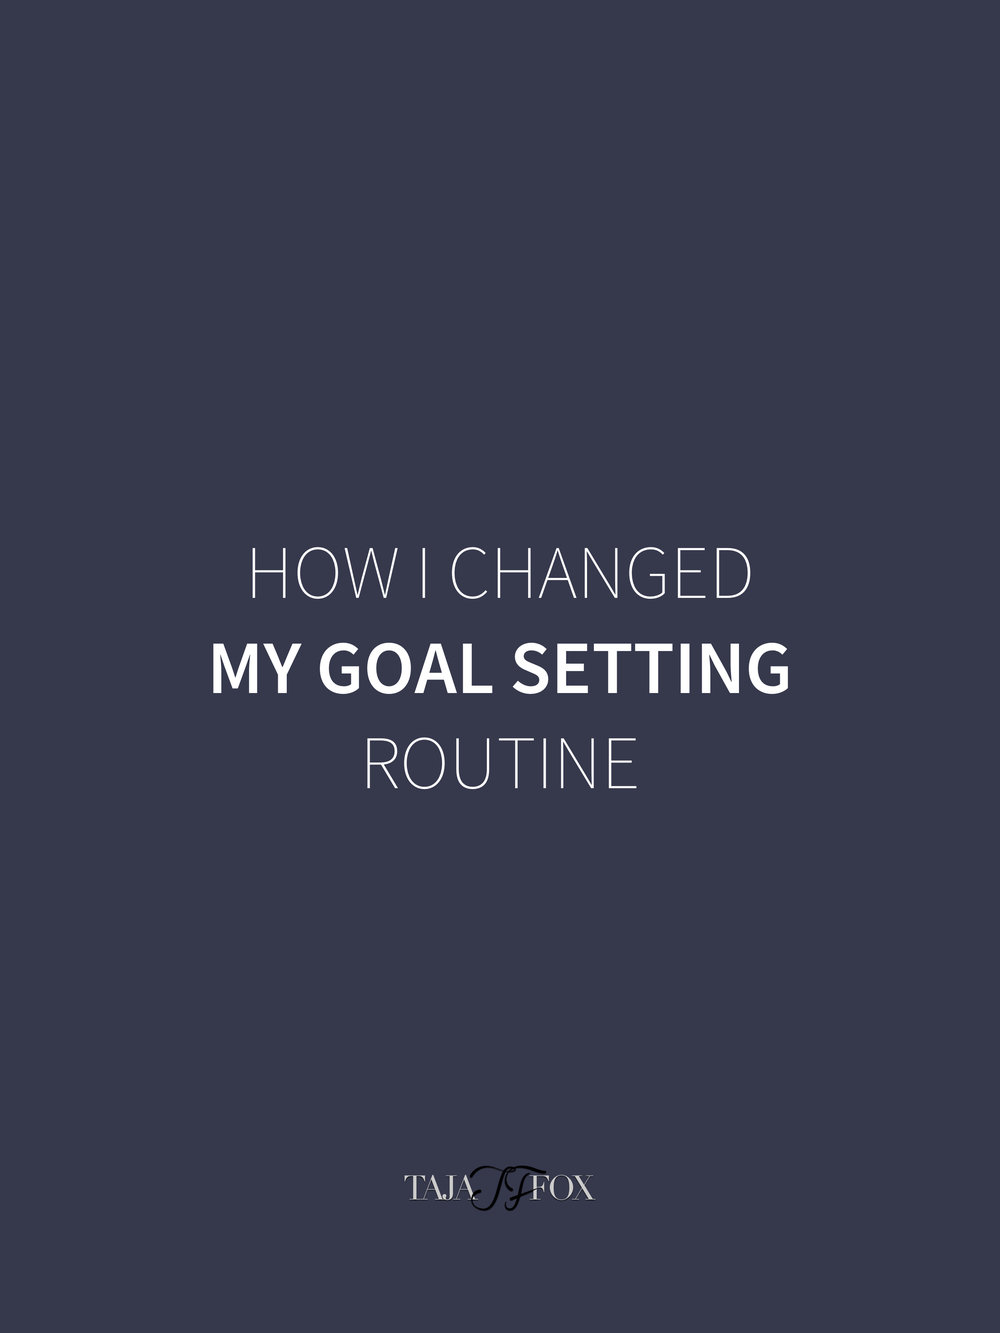 Goal Setting Routine tajafox.com.jpg